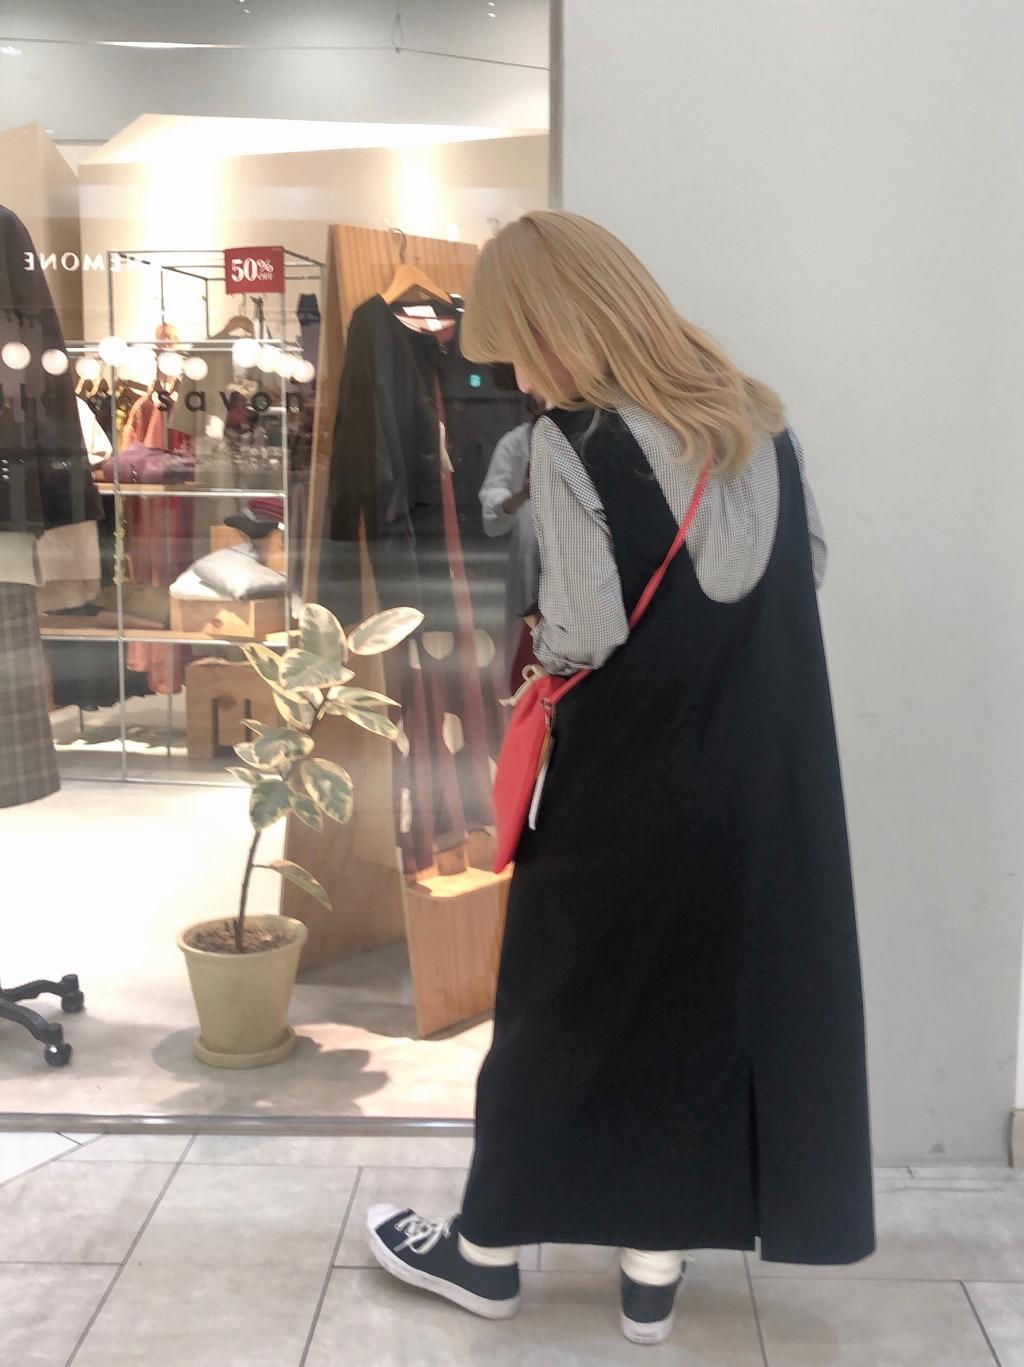 bulle de savon 阪急西宮ガーデンズ 身長:152cm 2020.01.31